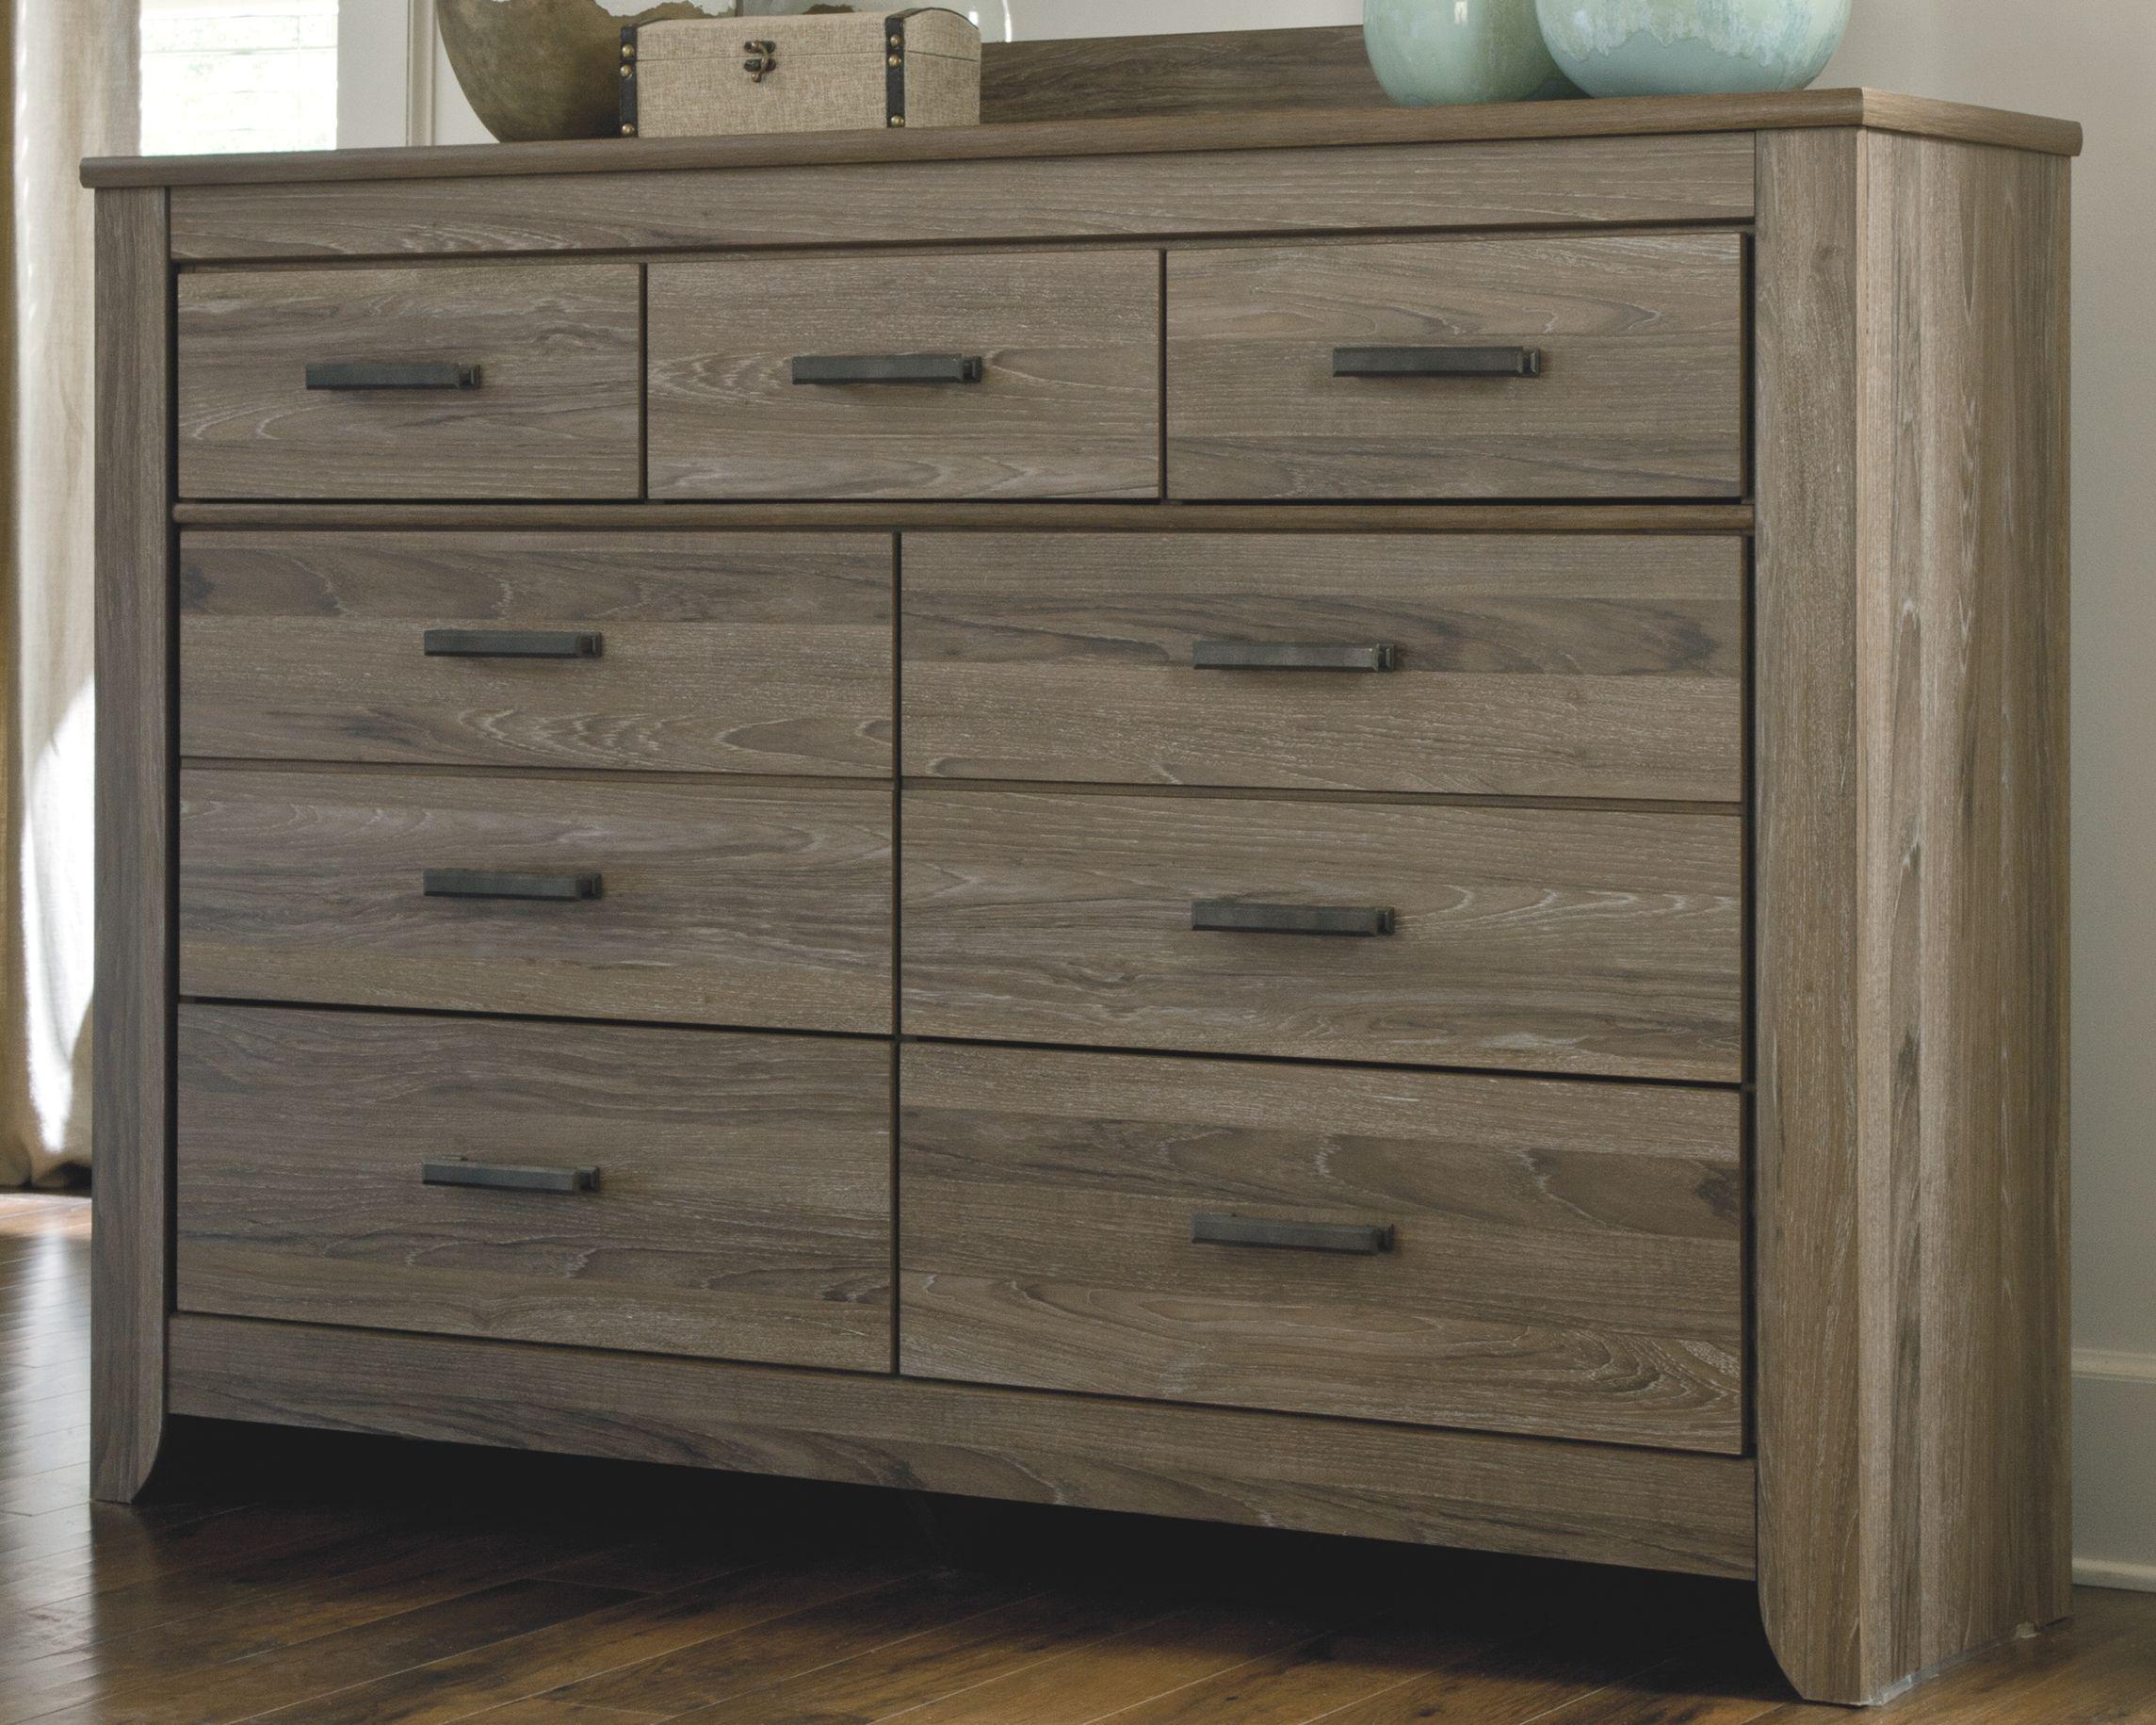 Zelen Dresser, Warm Gray Bedroom dressers, 7 drawer